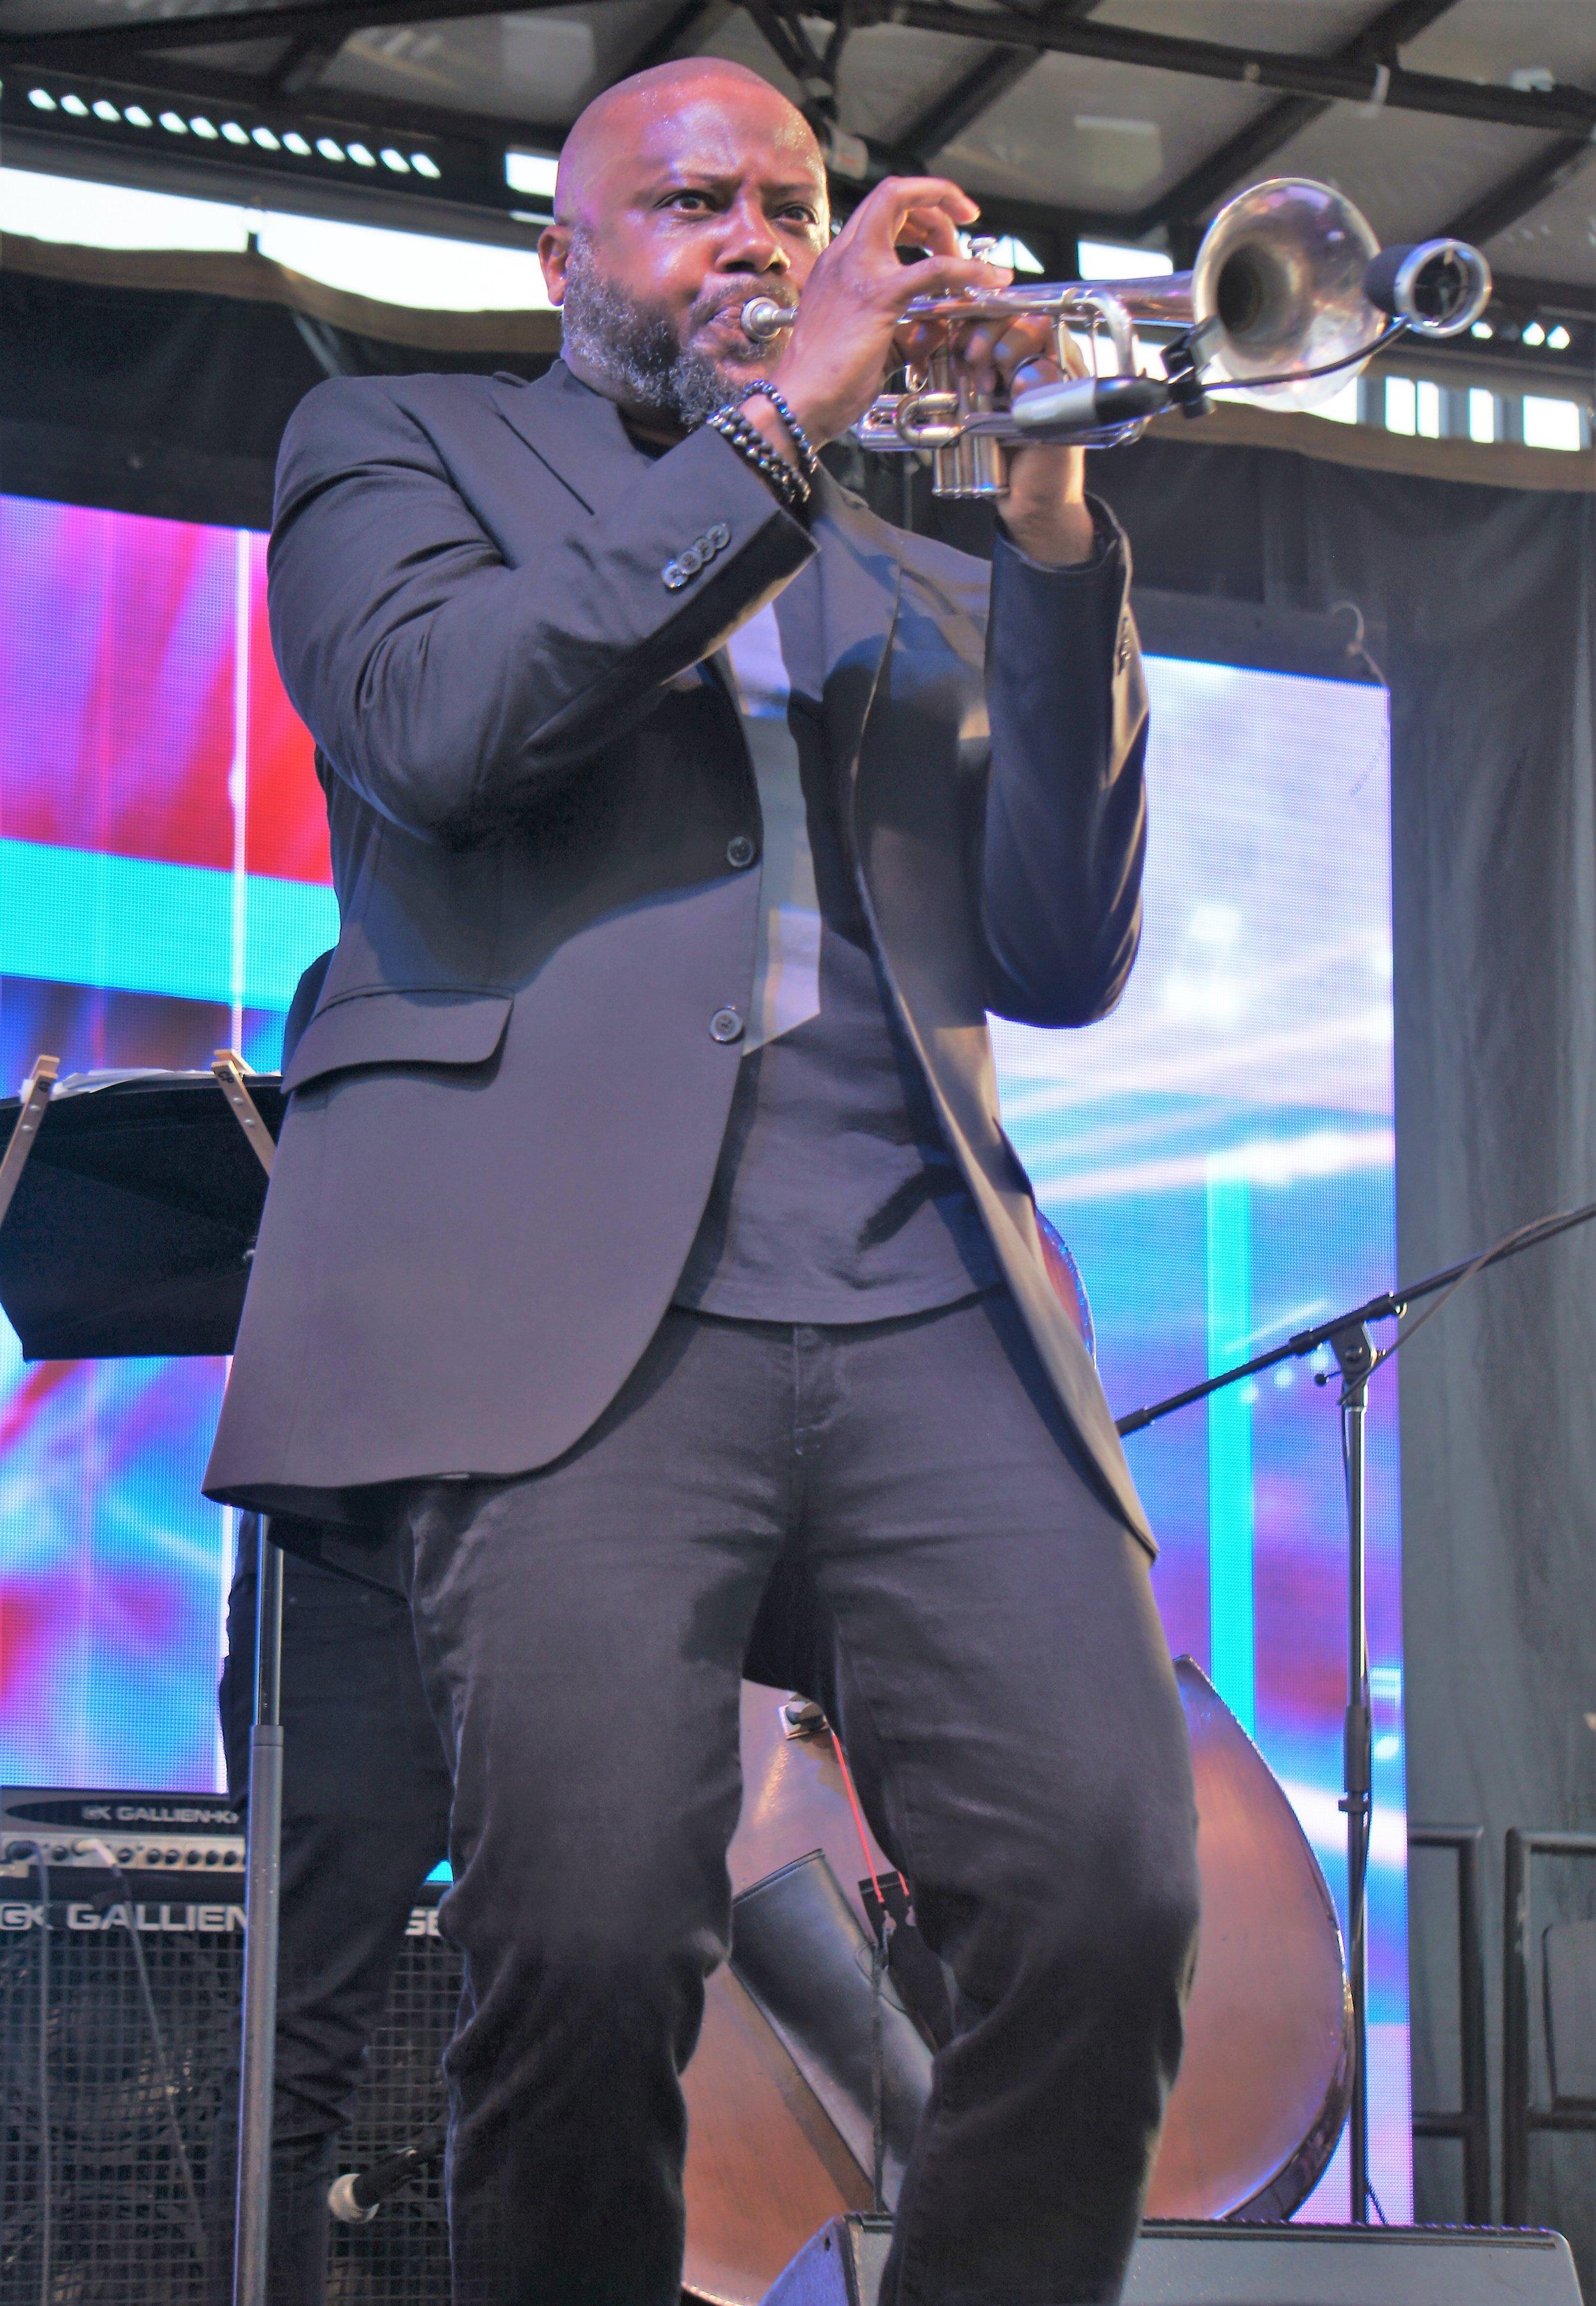 Trumpeter Sean Jones performing at The Wharf (photo by Bridget Arnwine)